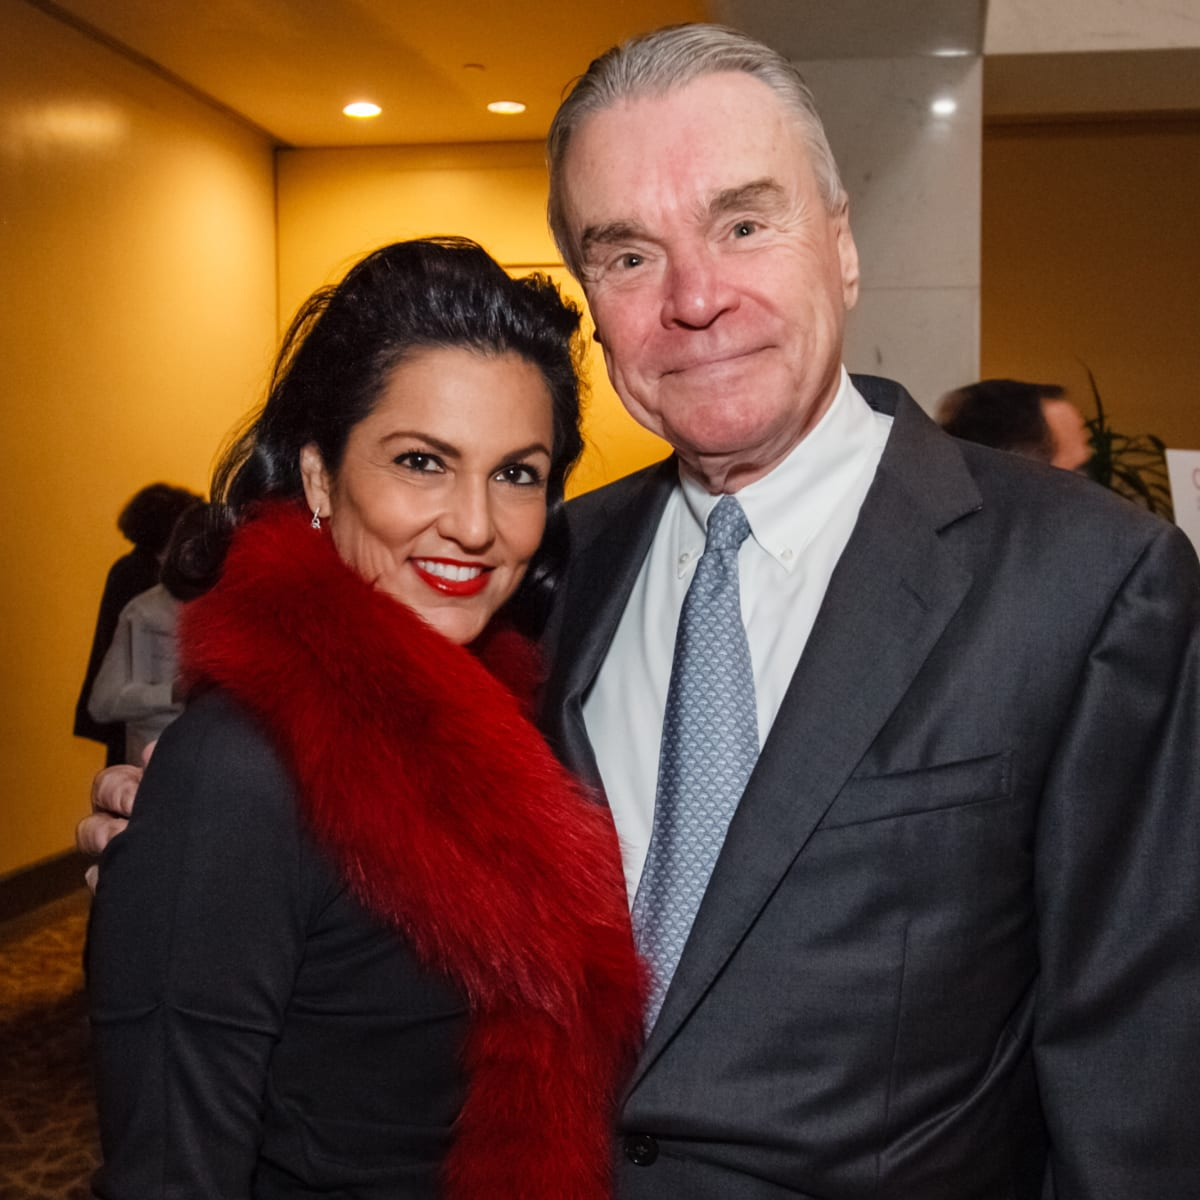 World AIDS Day luncheon Jessica Rossman and Gordon Bethune